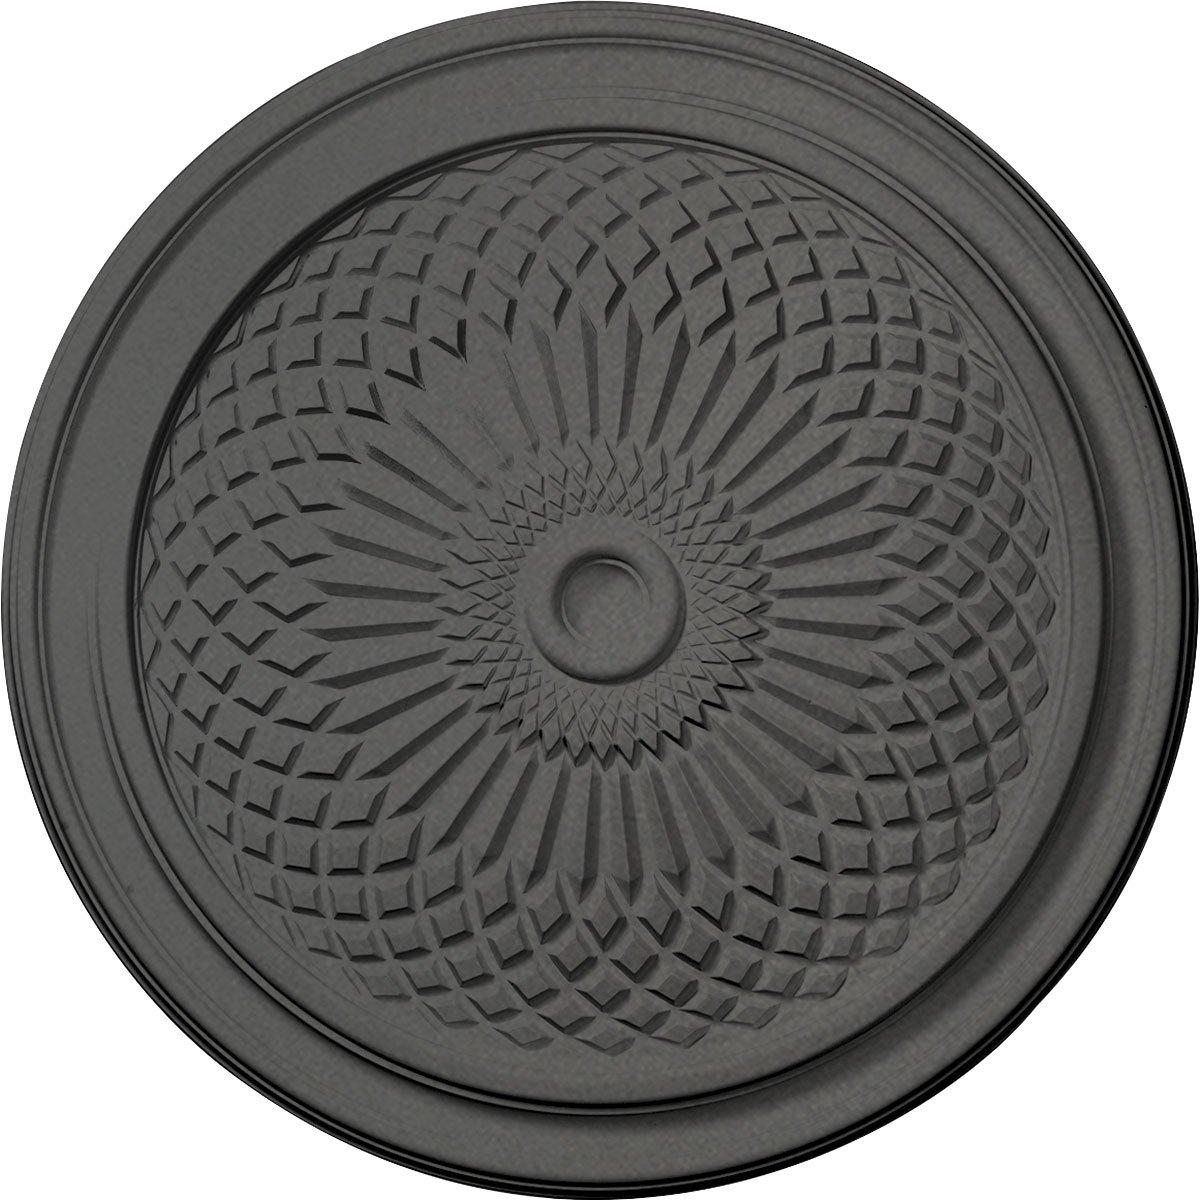 Ekena Millwork CM22TNSGS 22'' OD x 1 3/4'' P Trinity Ceiling Medallion fits Canopies up to 3'', Steel Gray